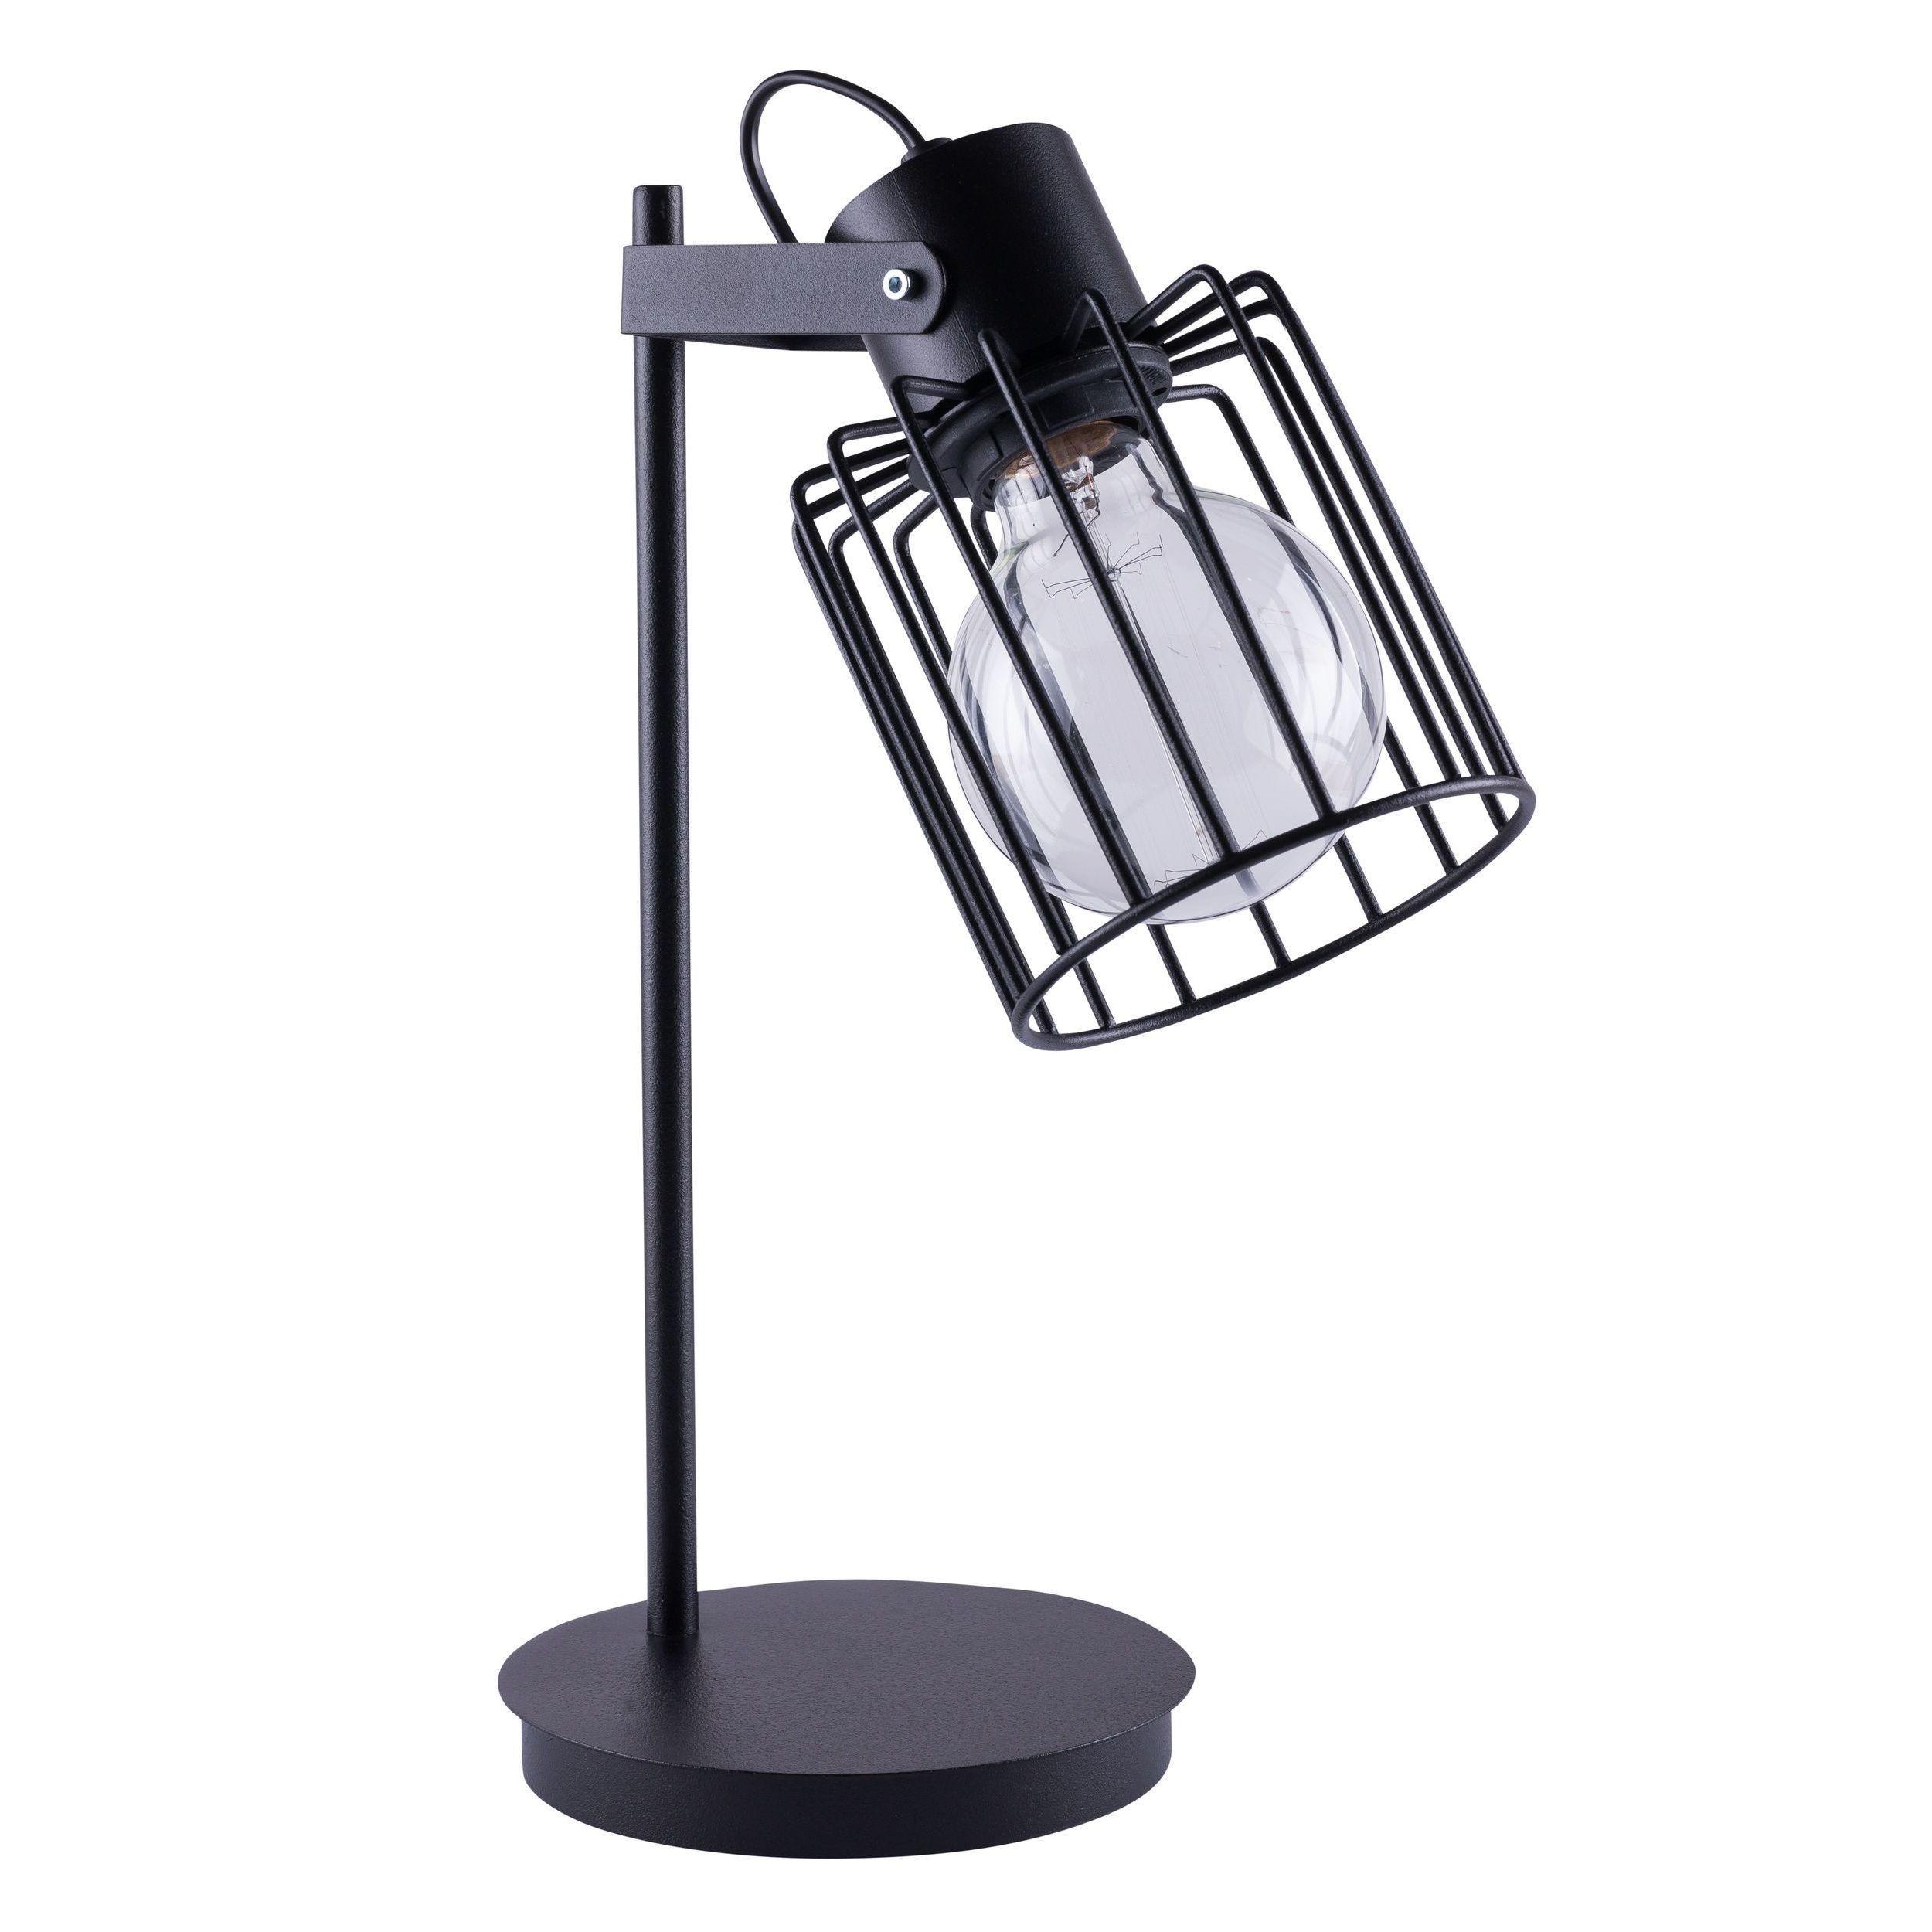 Lampa podwieszana Sigma Luto Kwadrat Lampka Czarny